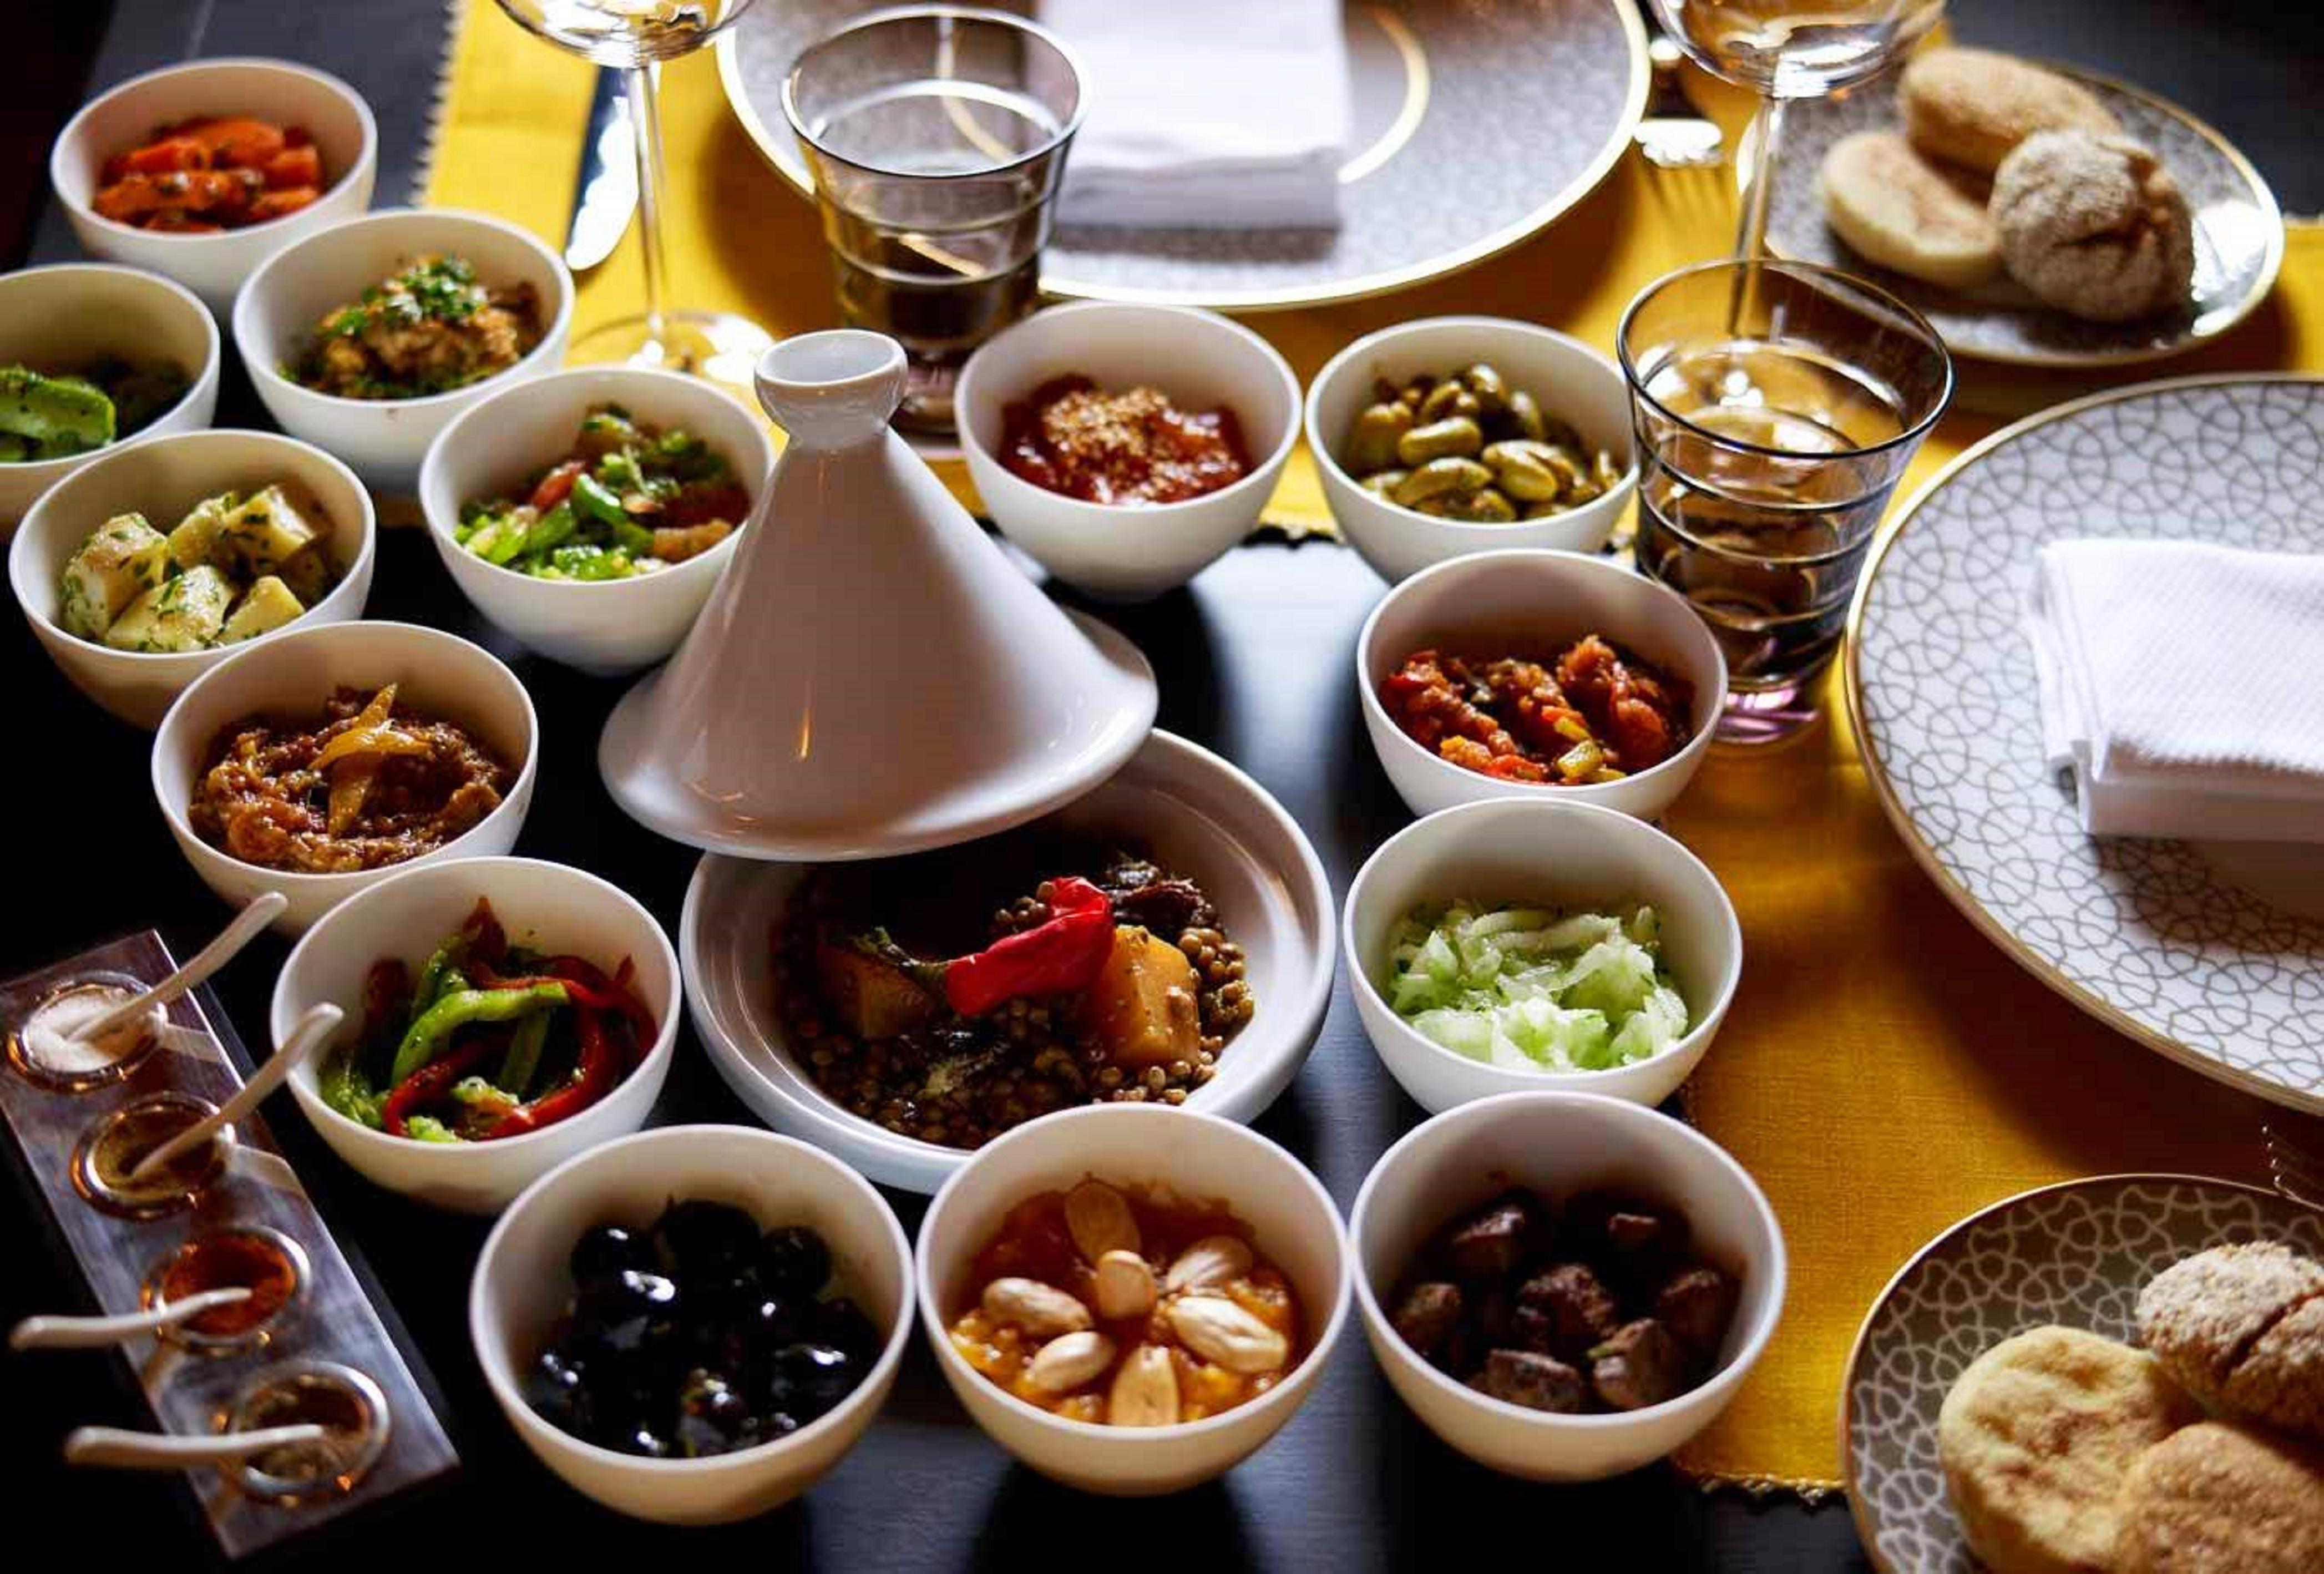 Marrakech - La Mamounia Restaurant Le Marocain 2